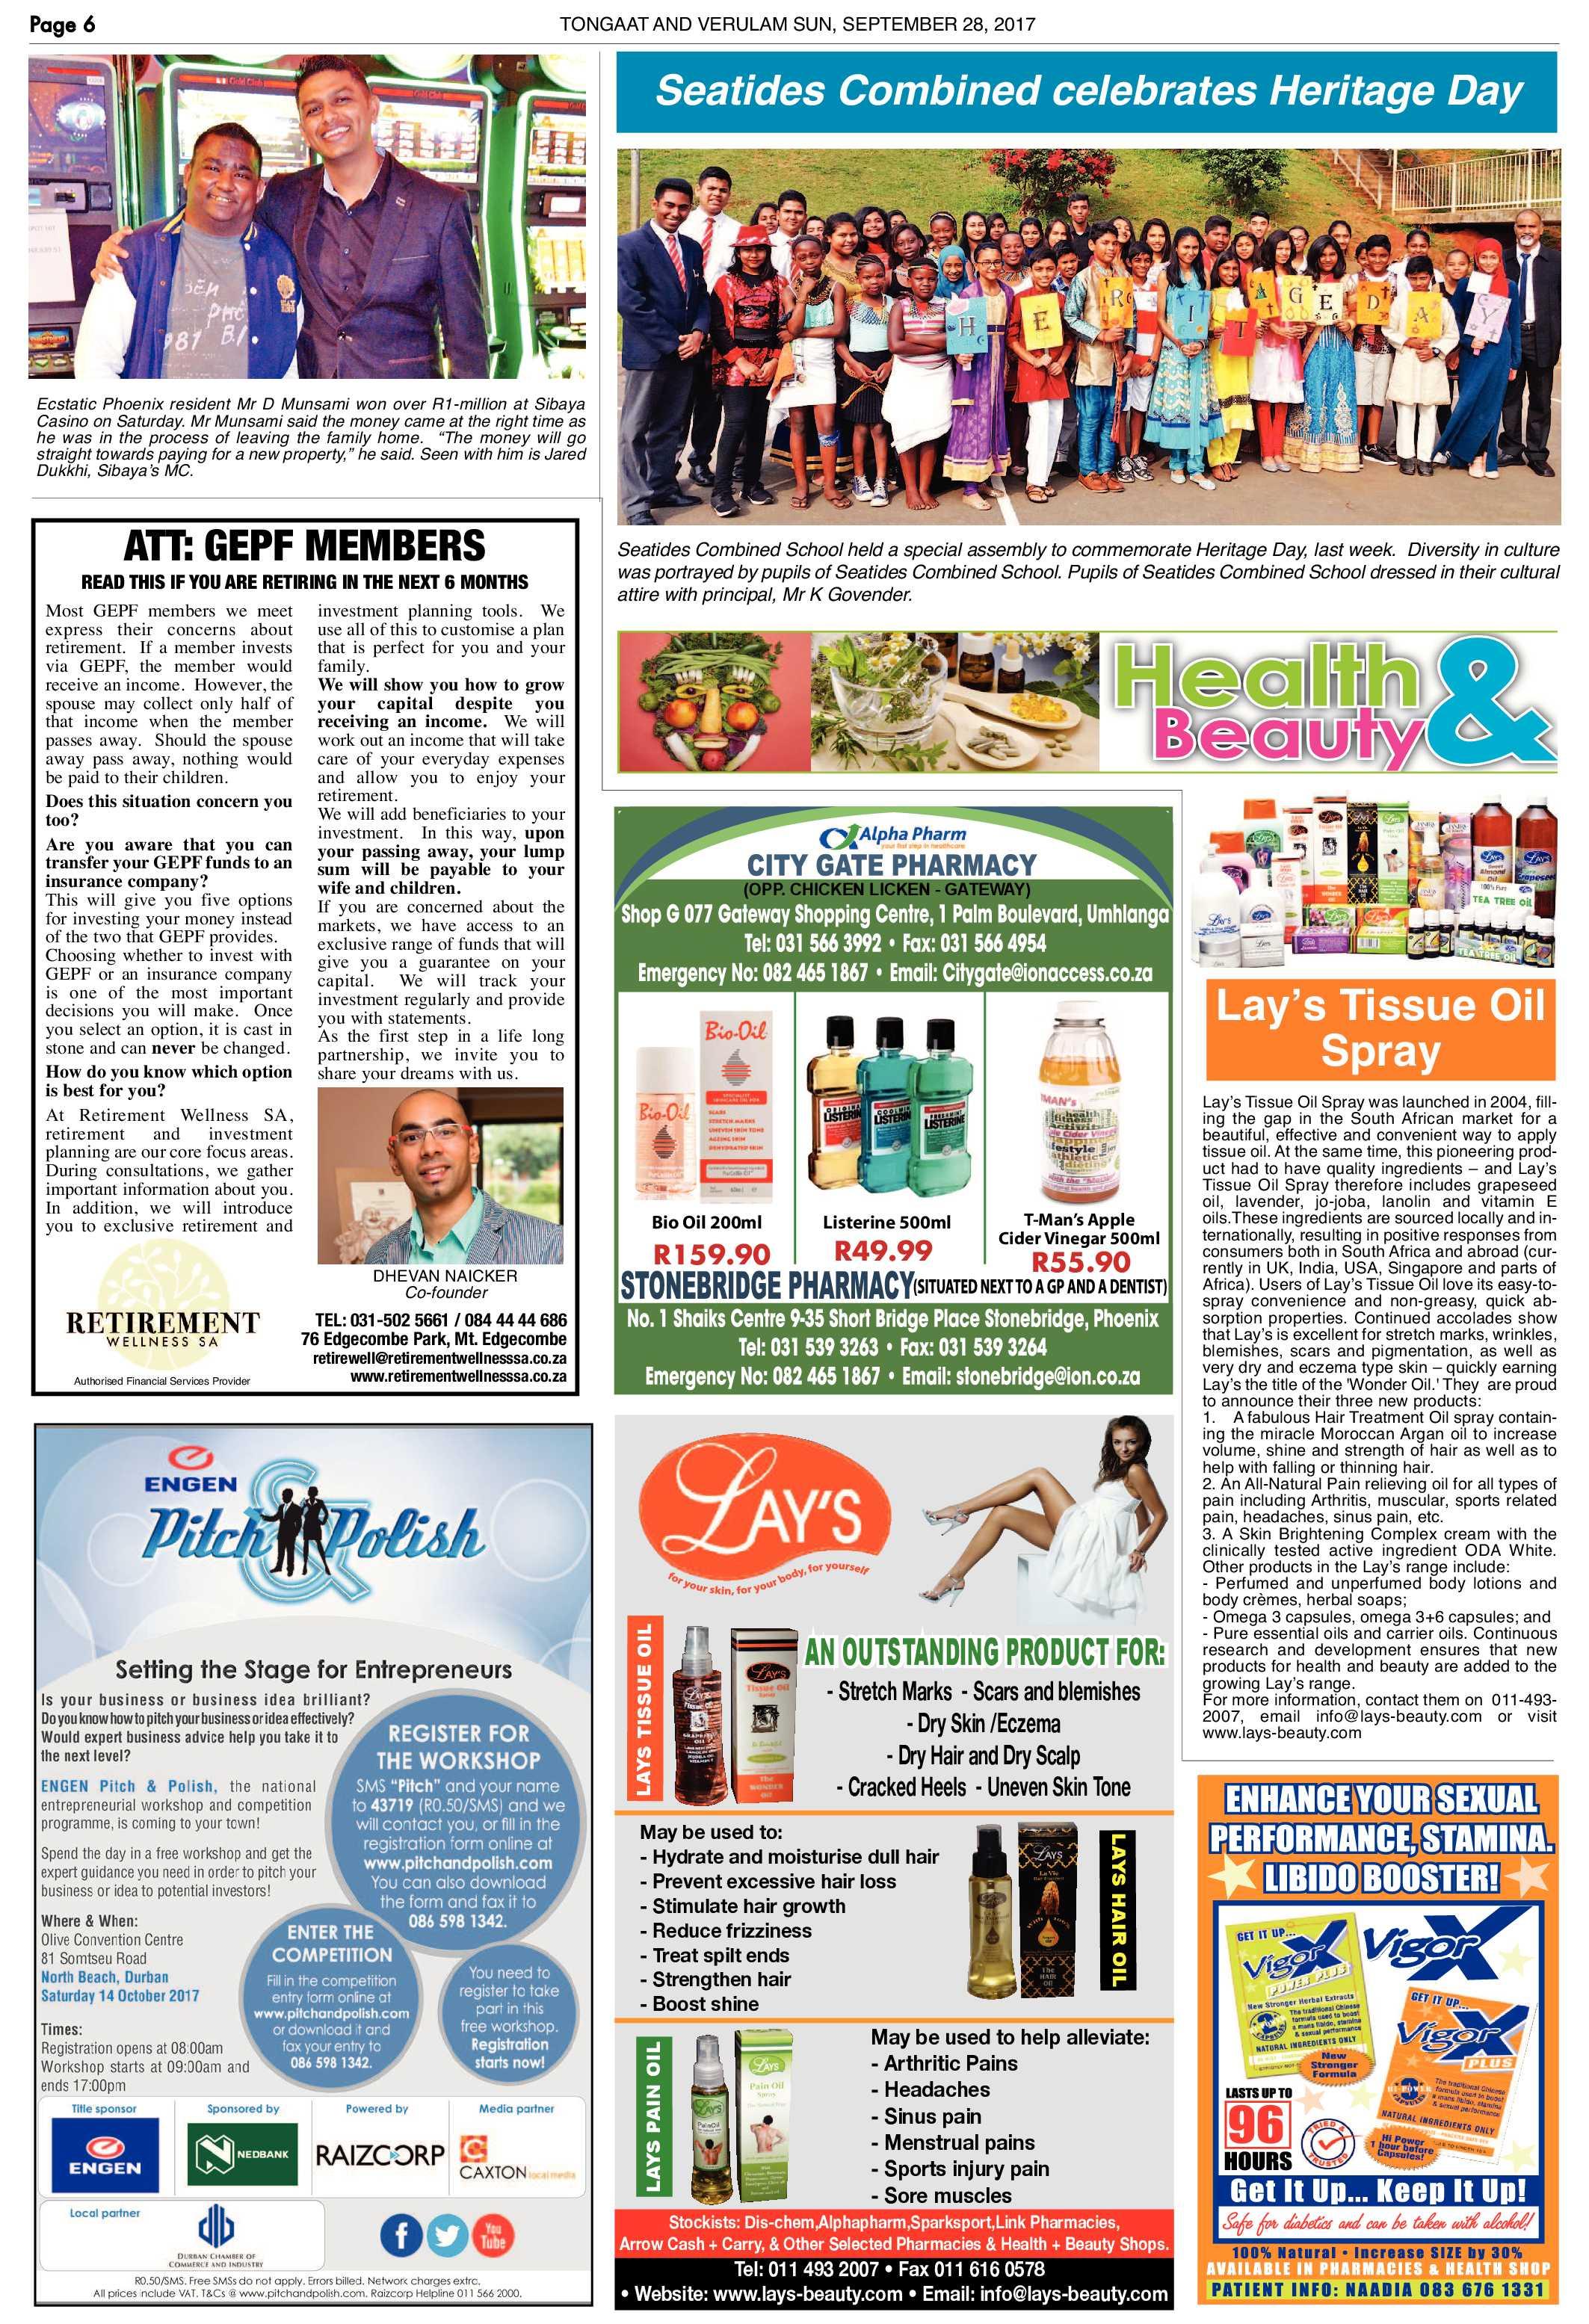 tongaat-verulam-sun-september-28-epapers-page-6